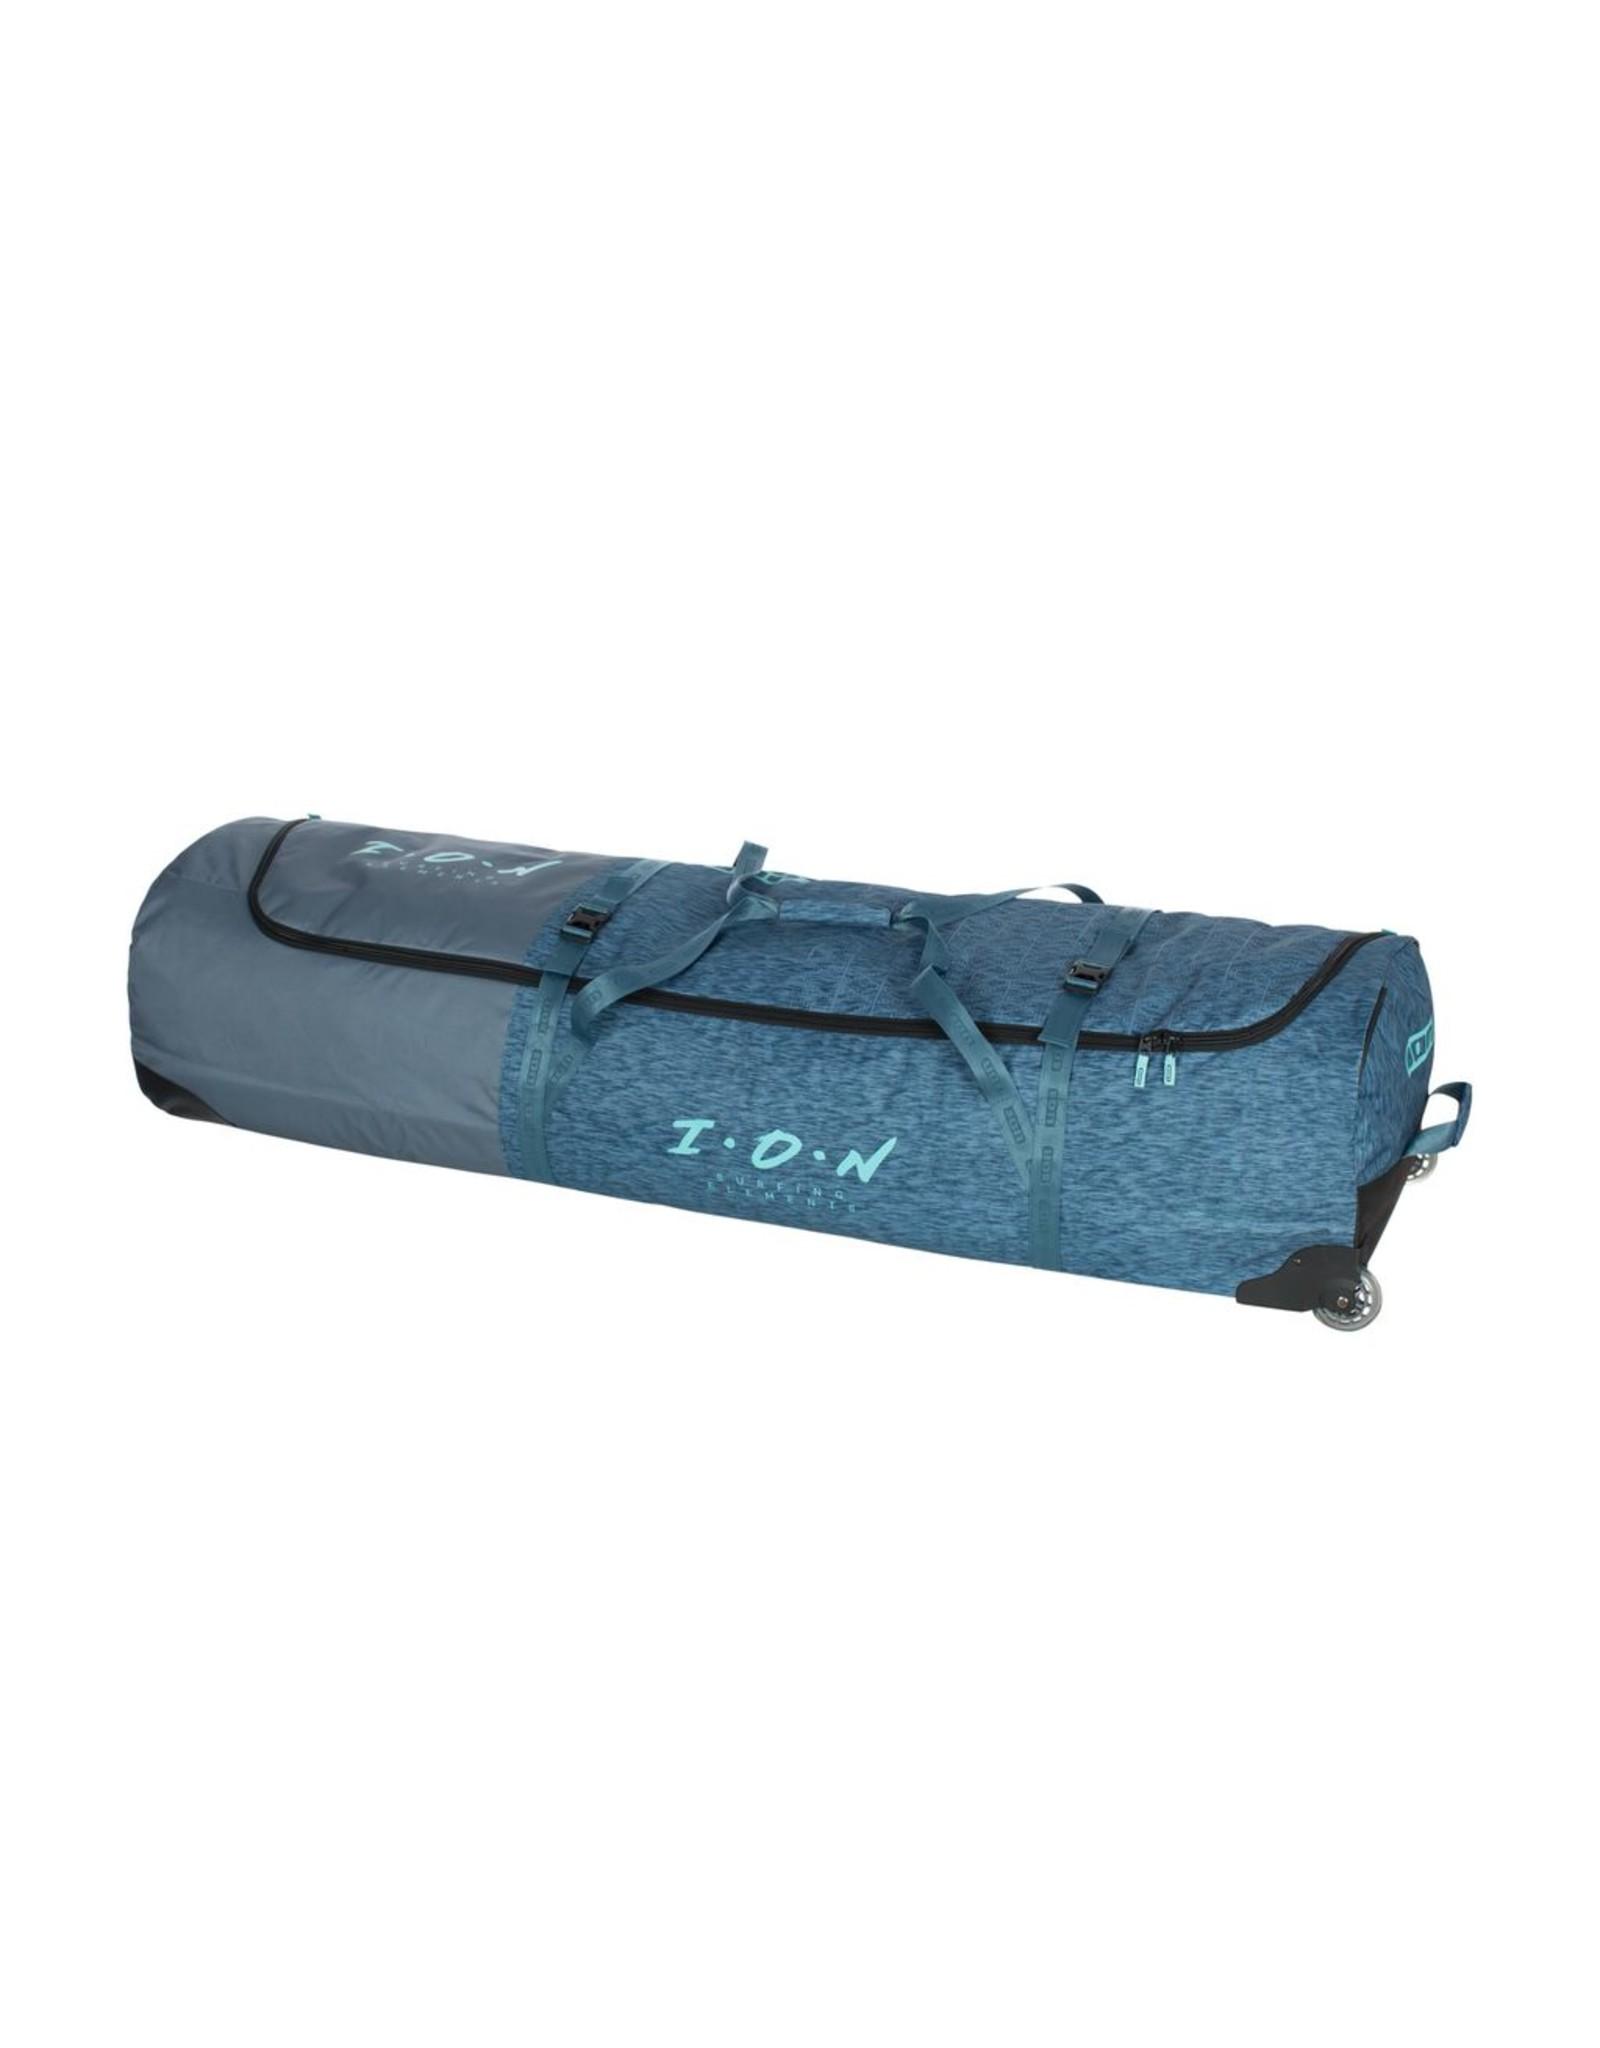 ION Ion - 167x50 Gearbag Core 165 (3,95kg max 167cm brett & ca 2-3 kiter)